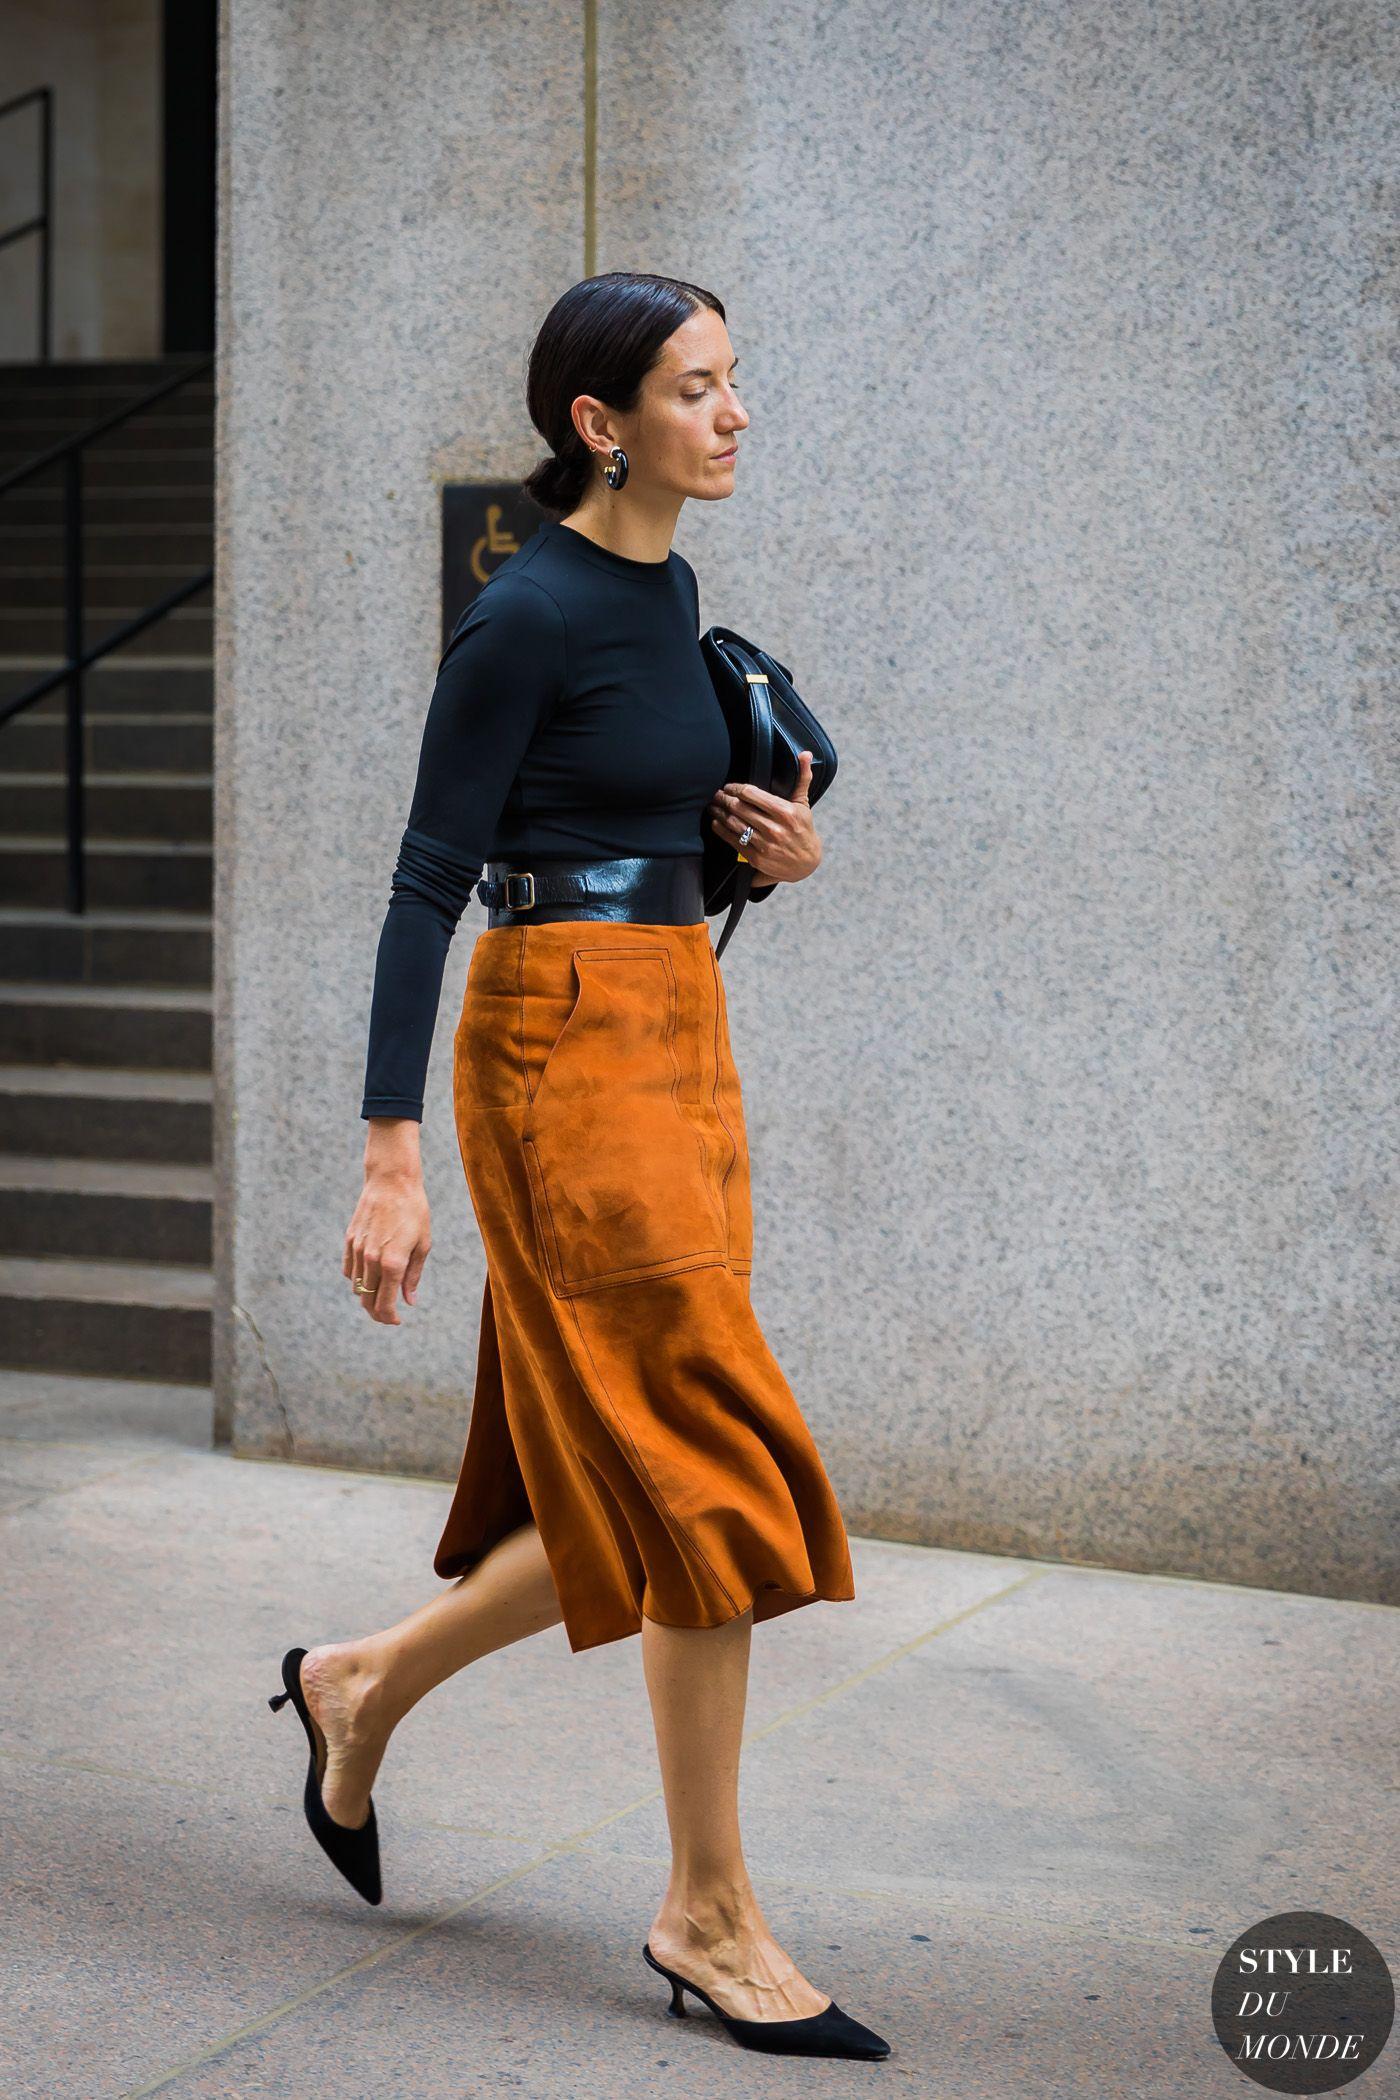 New York SS 2018 Street Style: Melissa Ventosa Martin